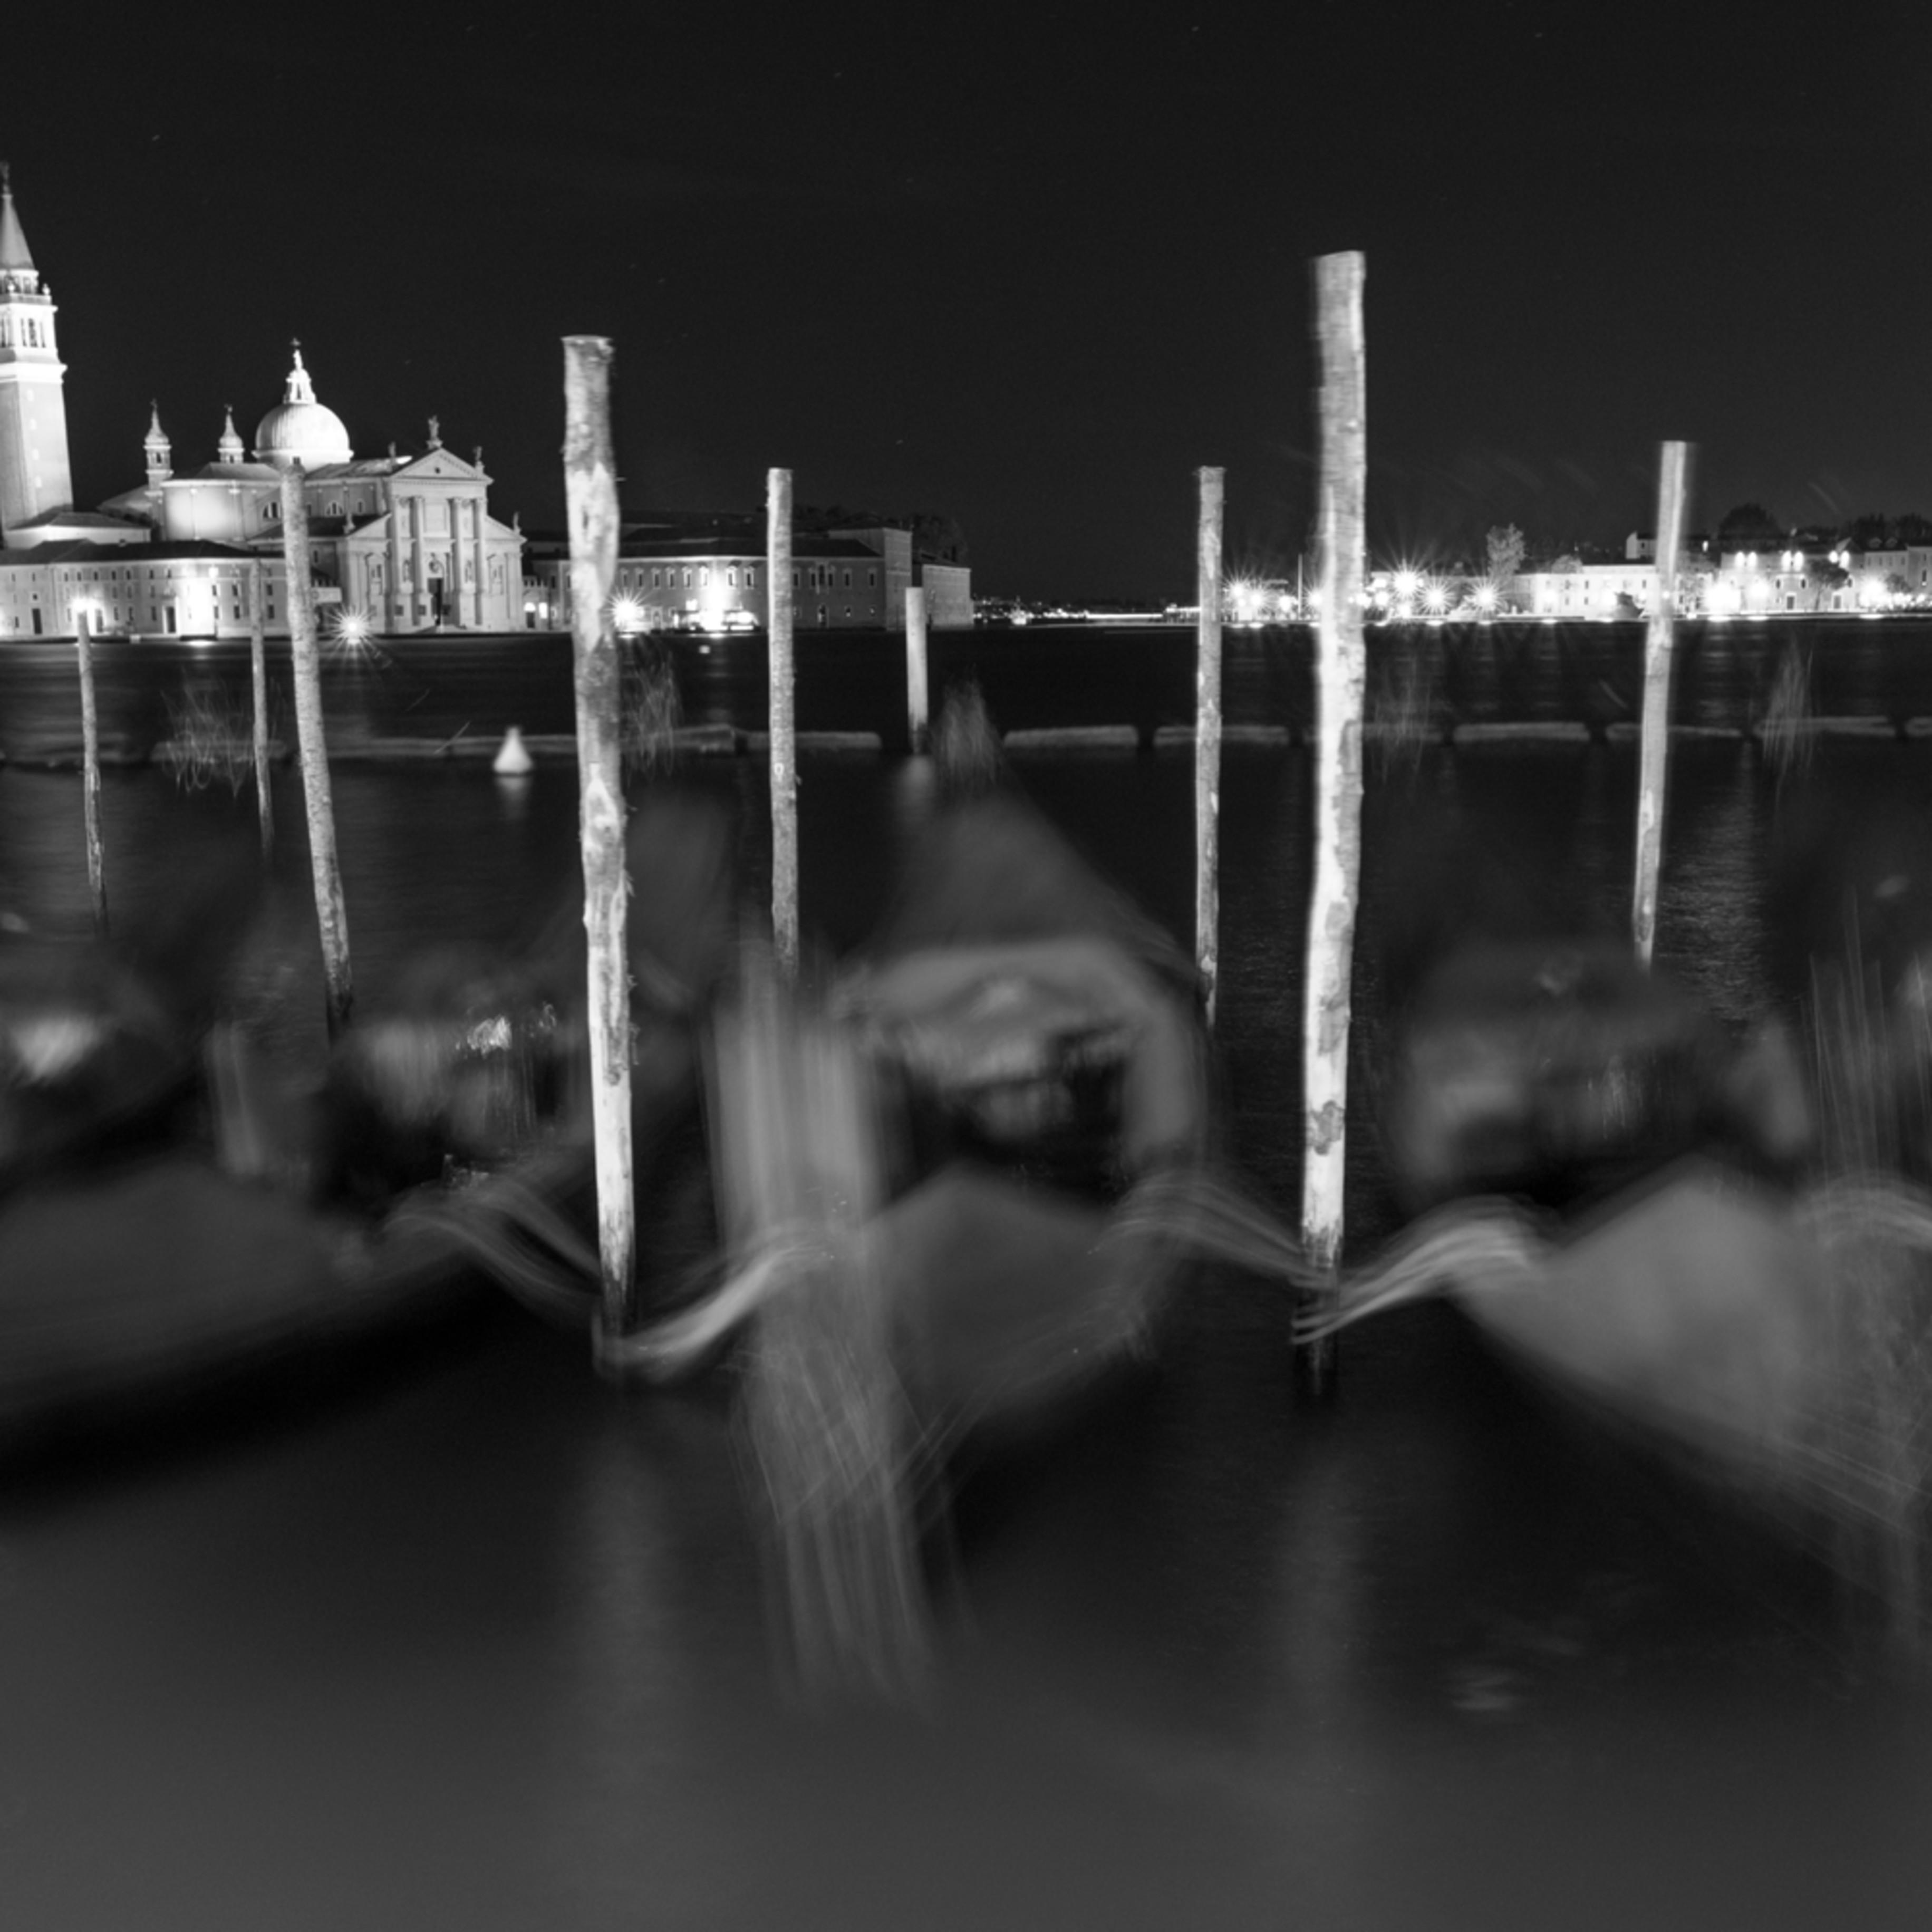 Blurred gondolas ujv4ur